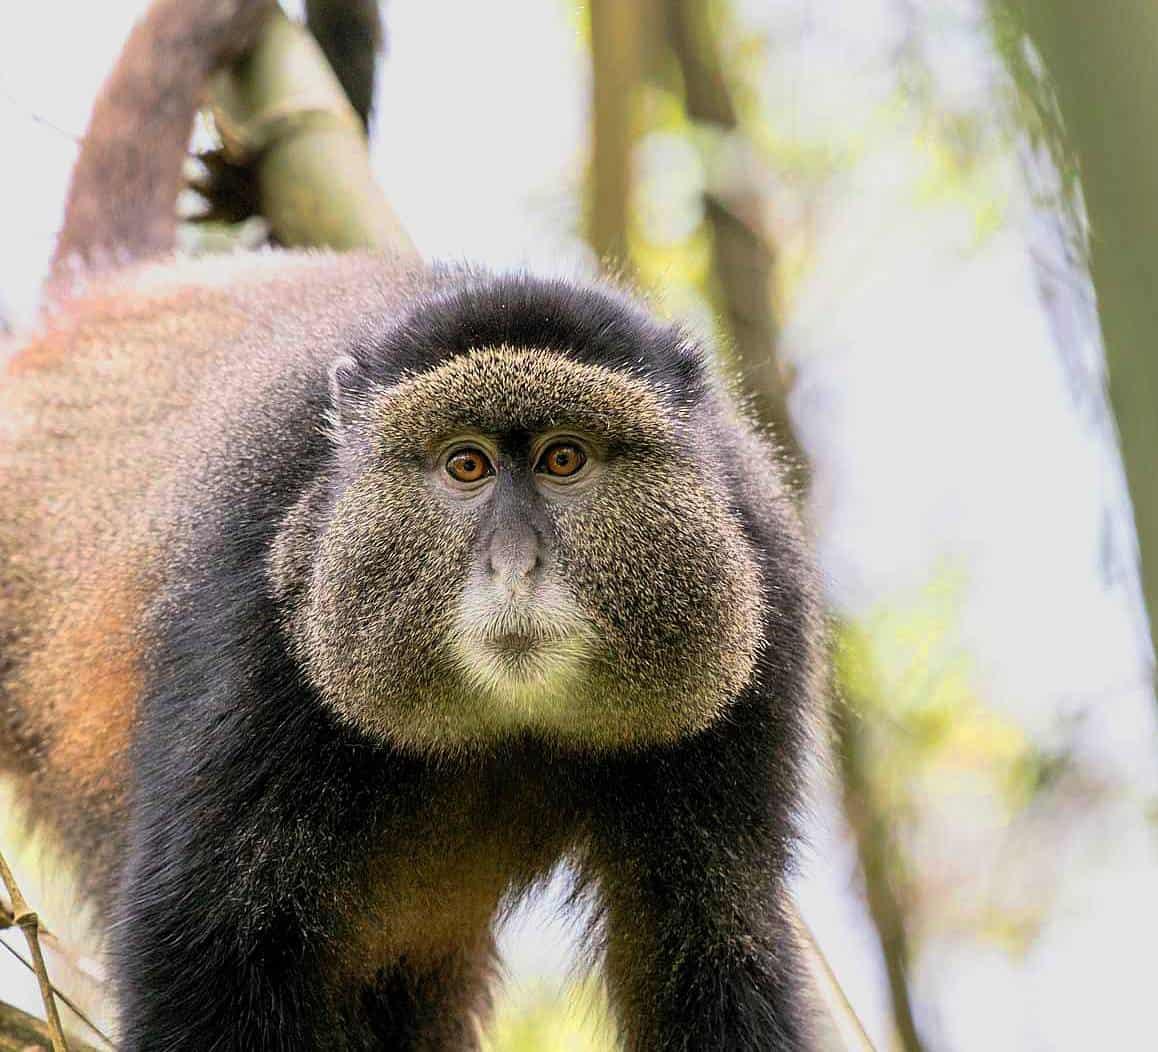 Tracking Down The Golden Monkeys Of Mount Gahinga